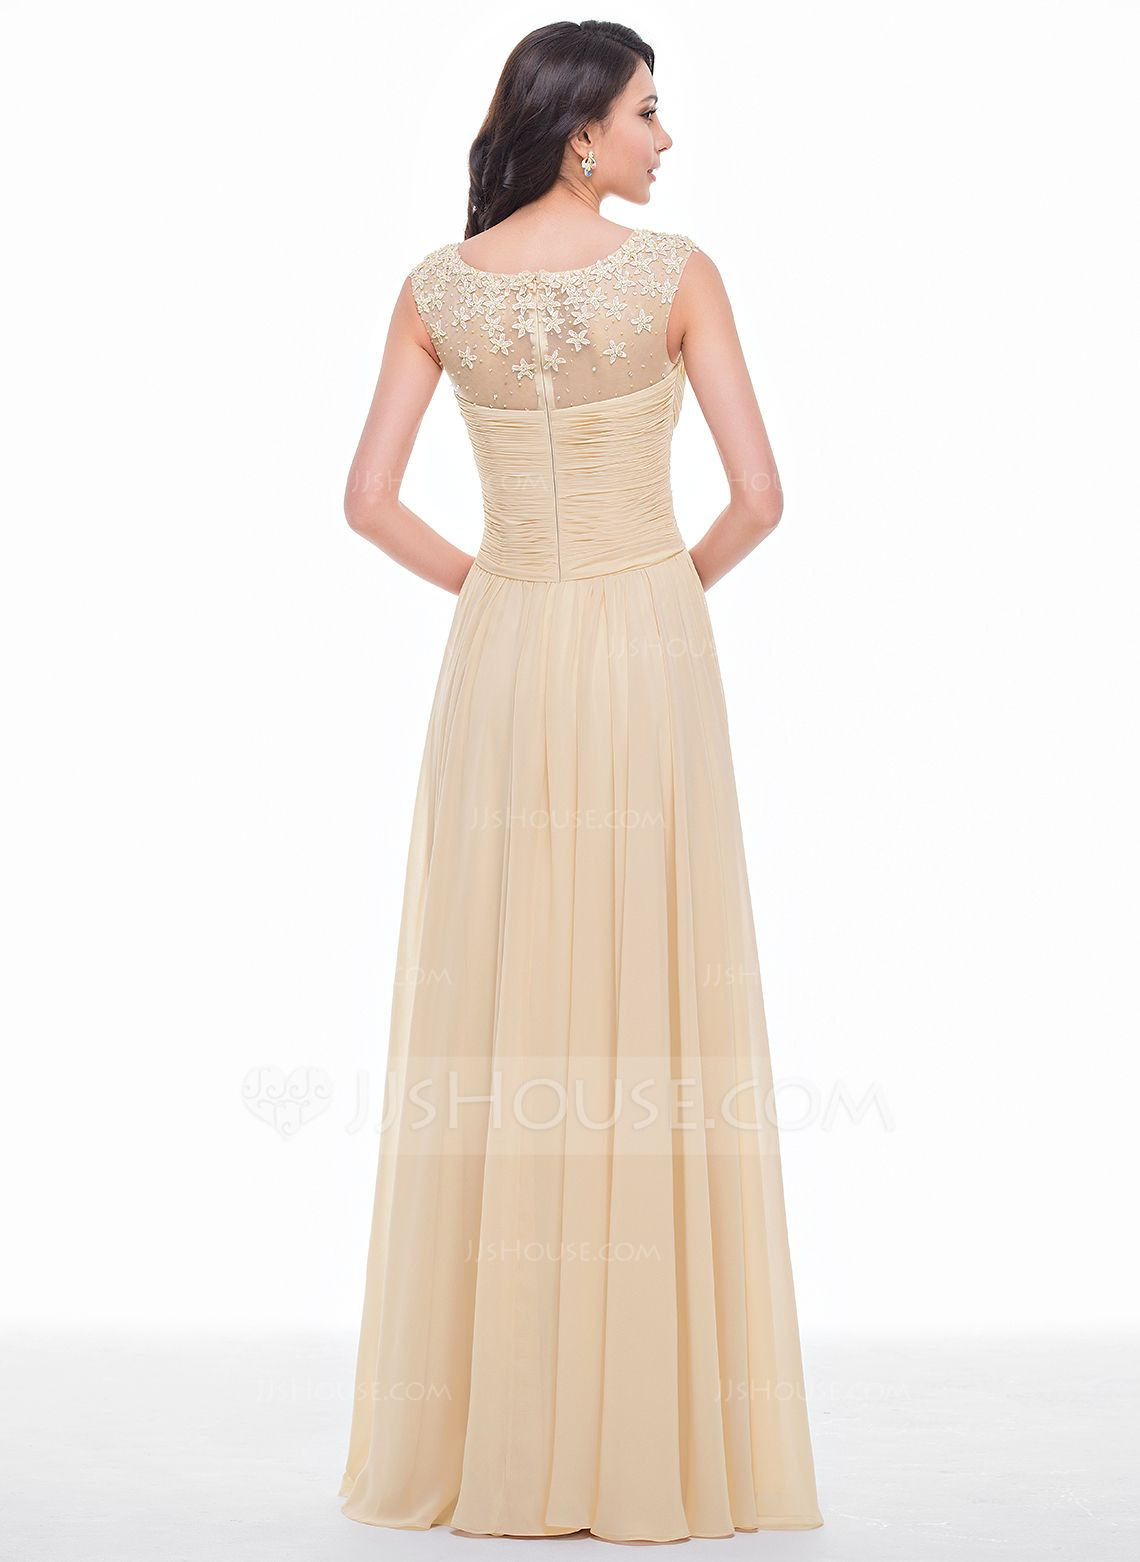 Alineprincess scoop neck floorlength chiffon prom dress with